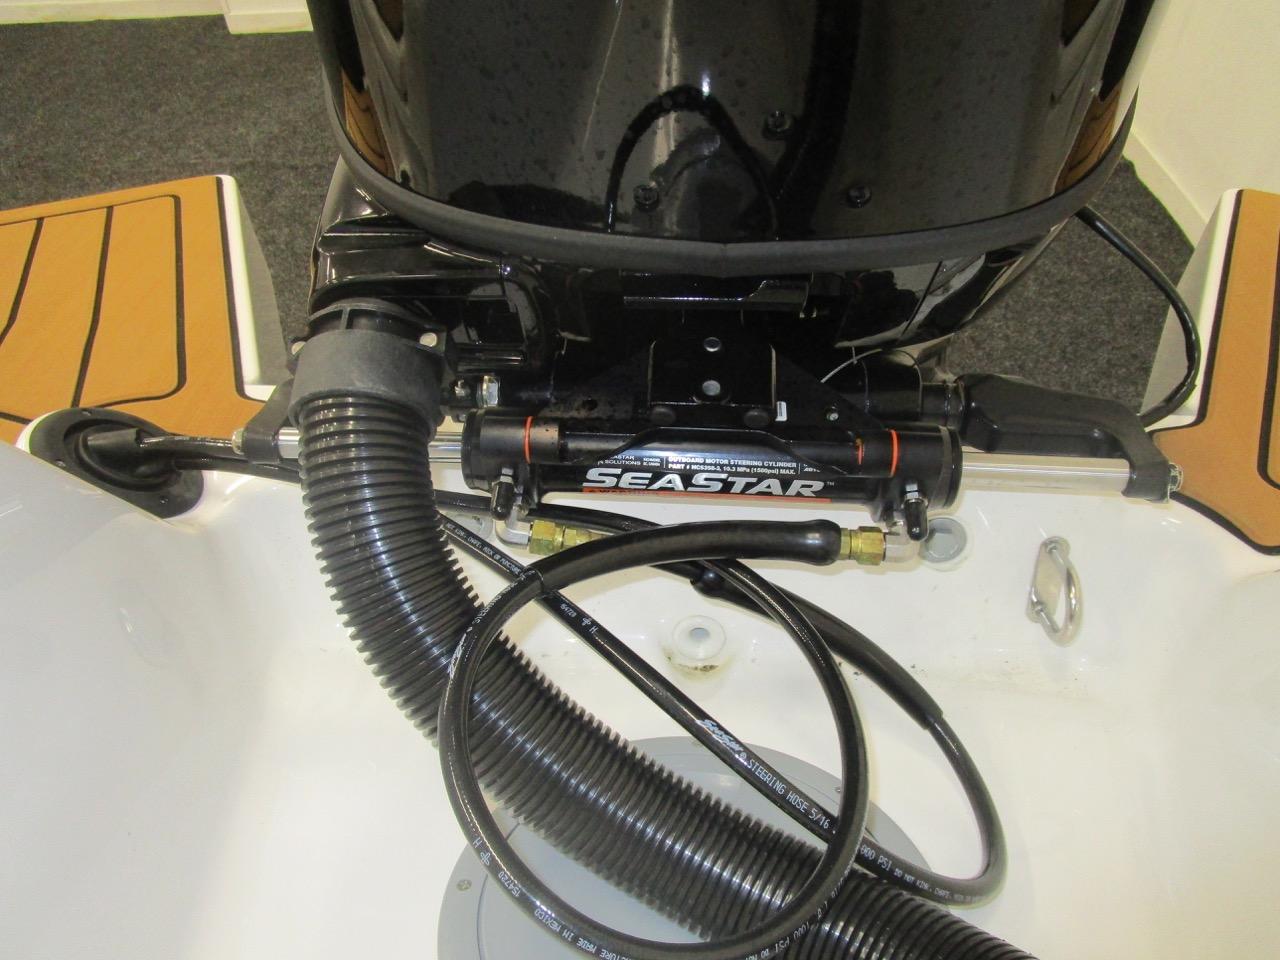 GRAND DRIVE D600 Seastar Hydraulic steering